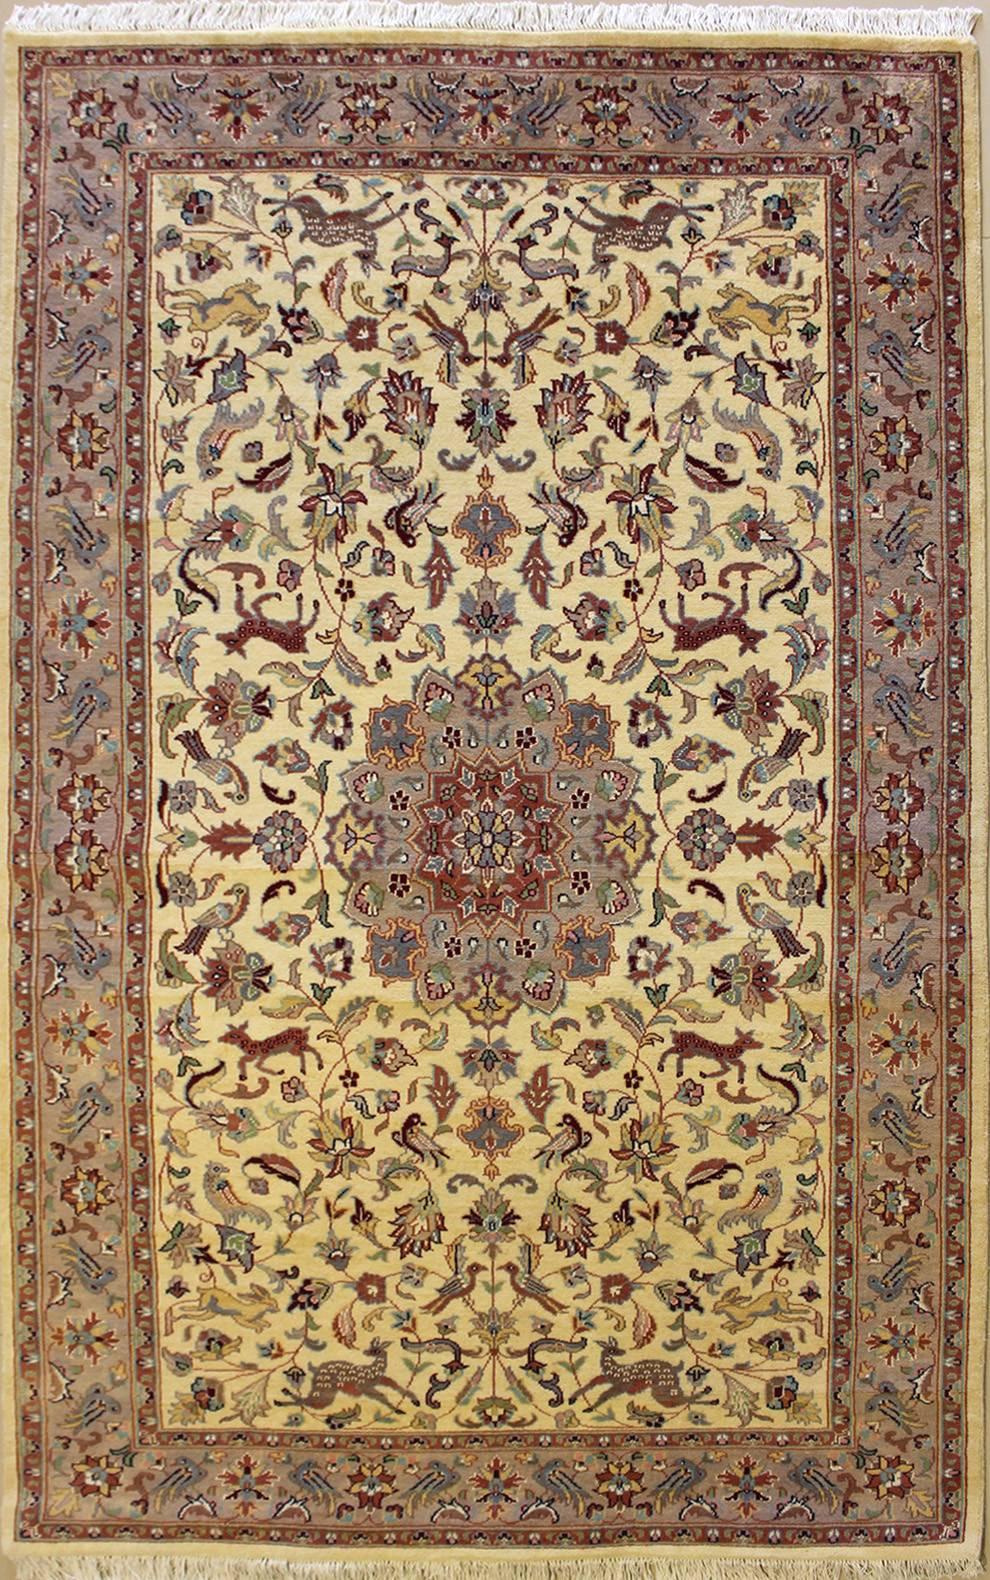 5 1x8 3 Rug Fl Handmade Pak Persian High Quality Rugs A 5x8 Size Rugstc